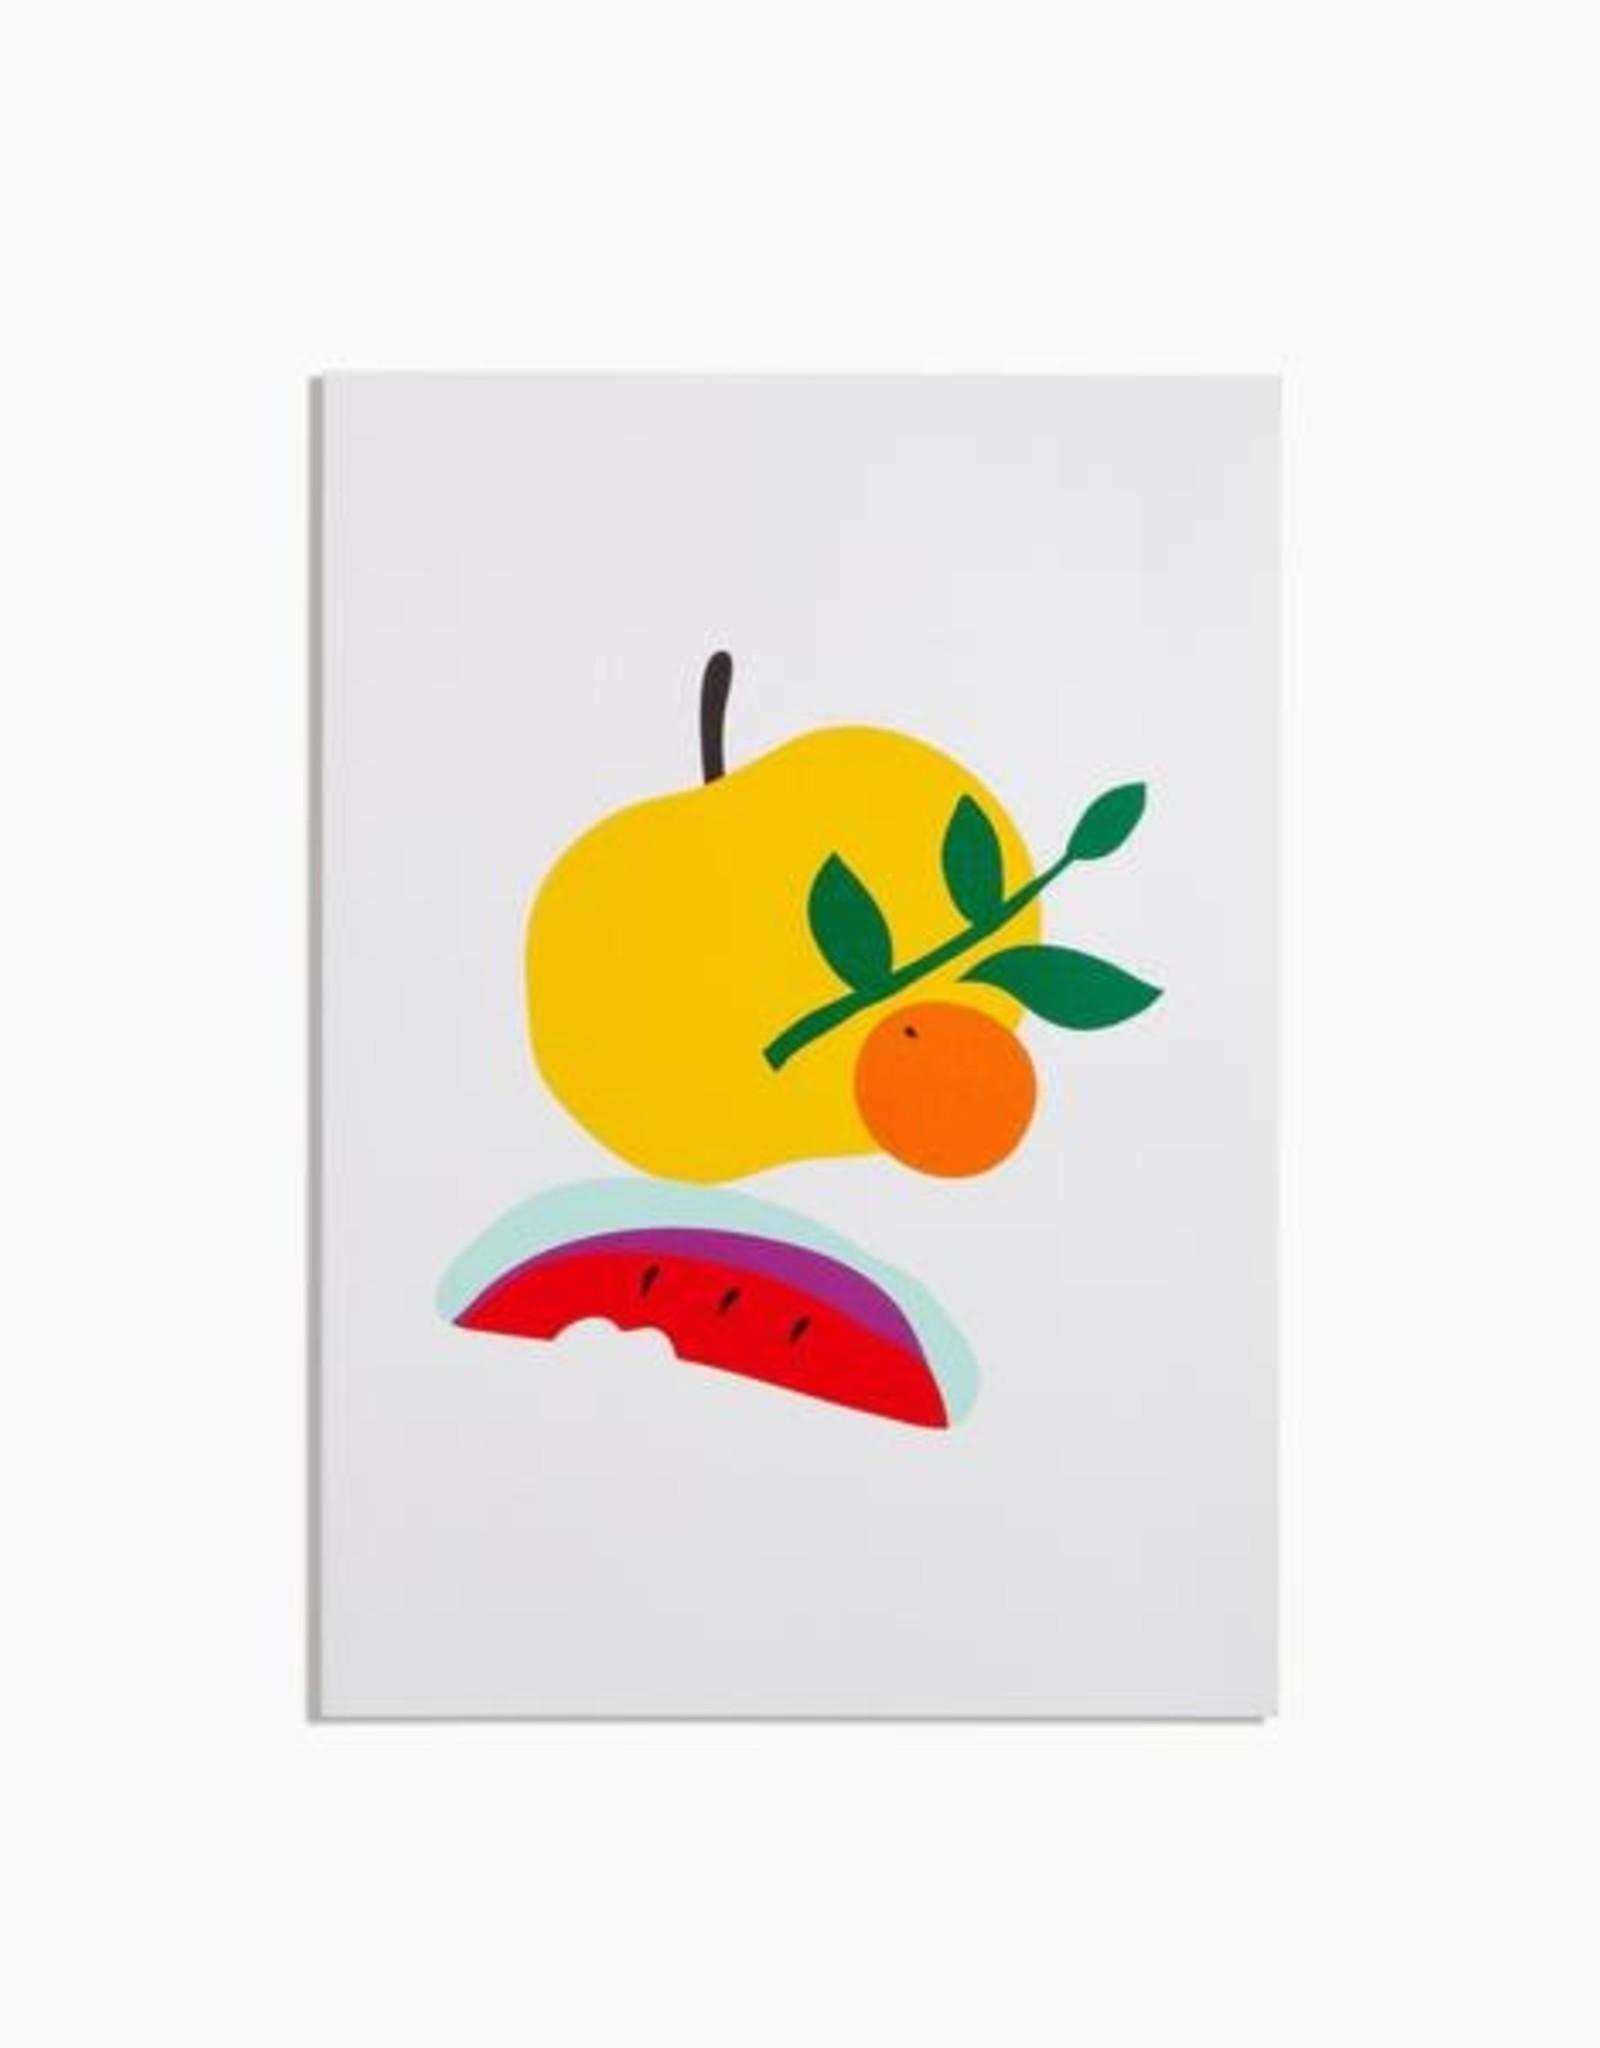 Poketo Simple Lined Notebook - Tangerine